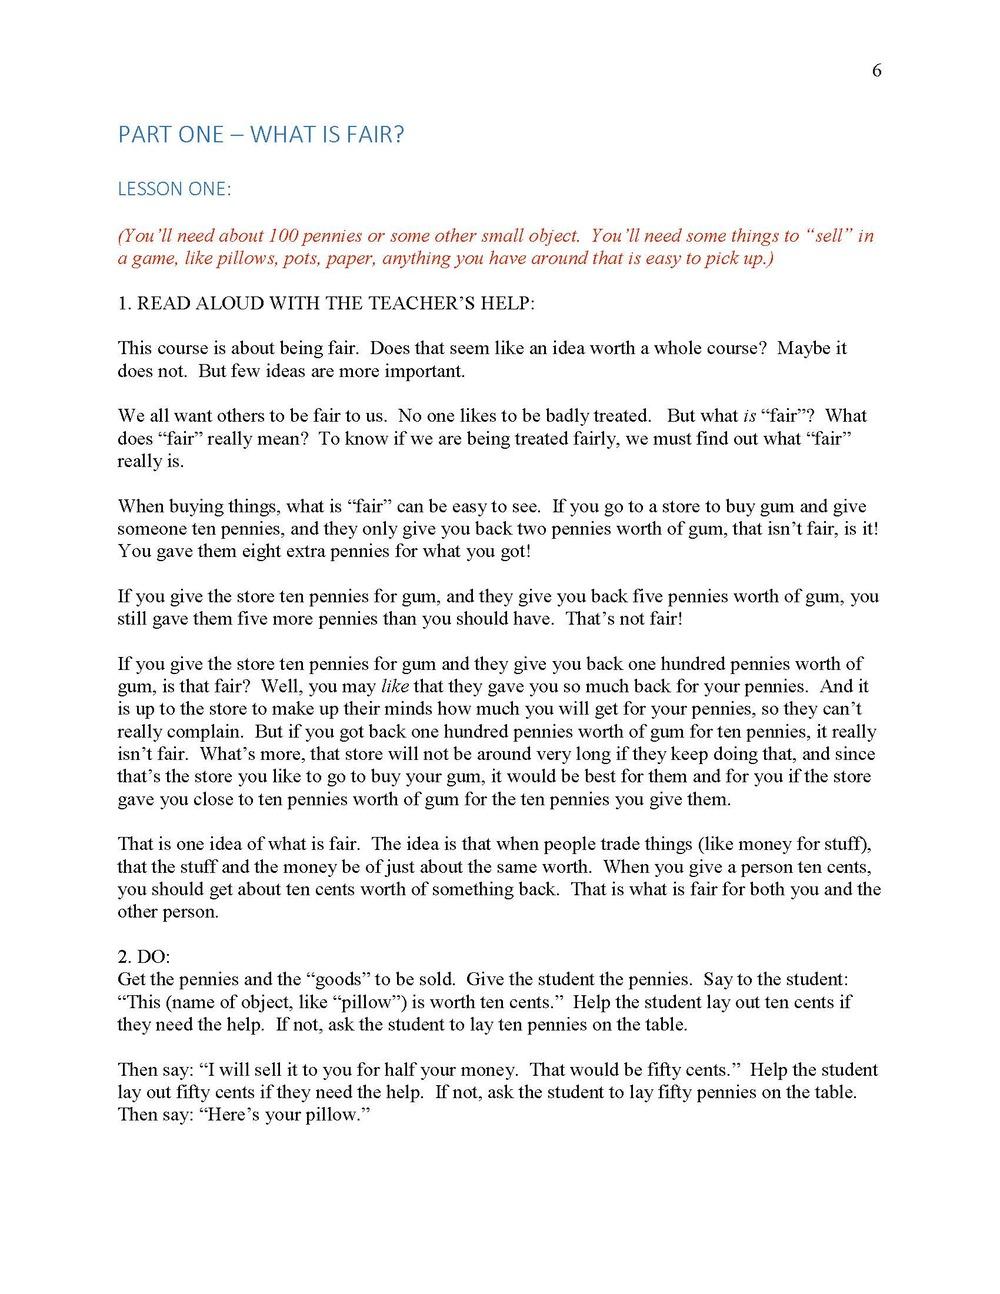 Step 1 Study & Life Skills 7 - What's Fair_Page_07.jpg